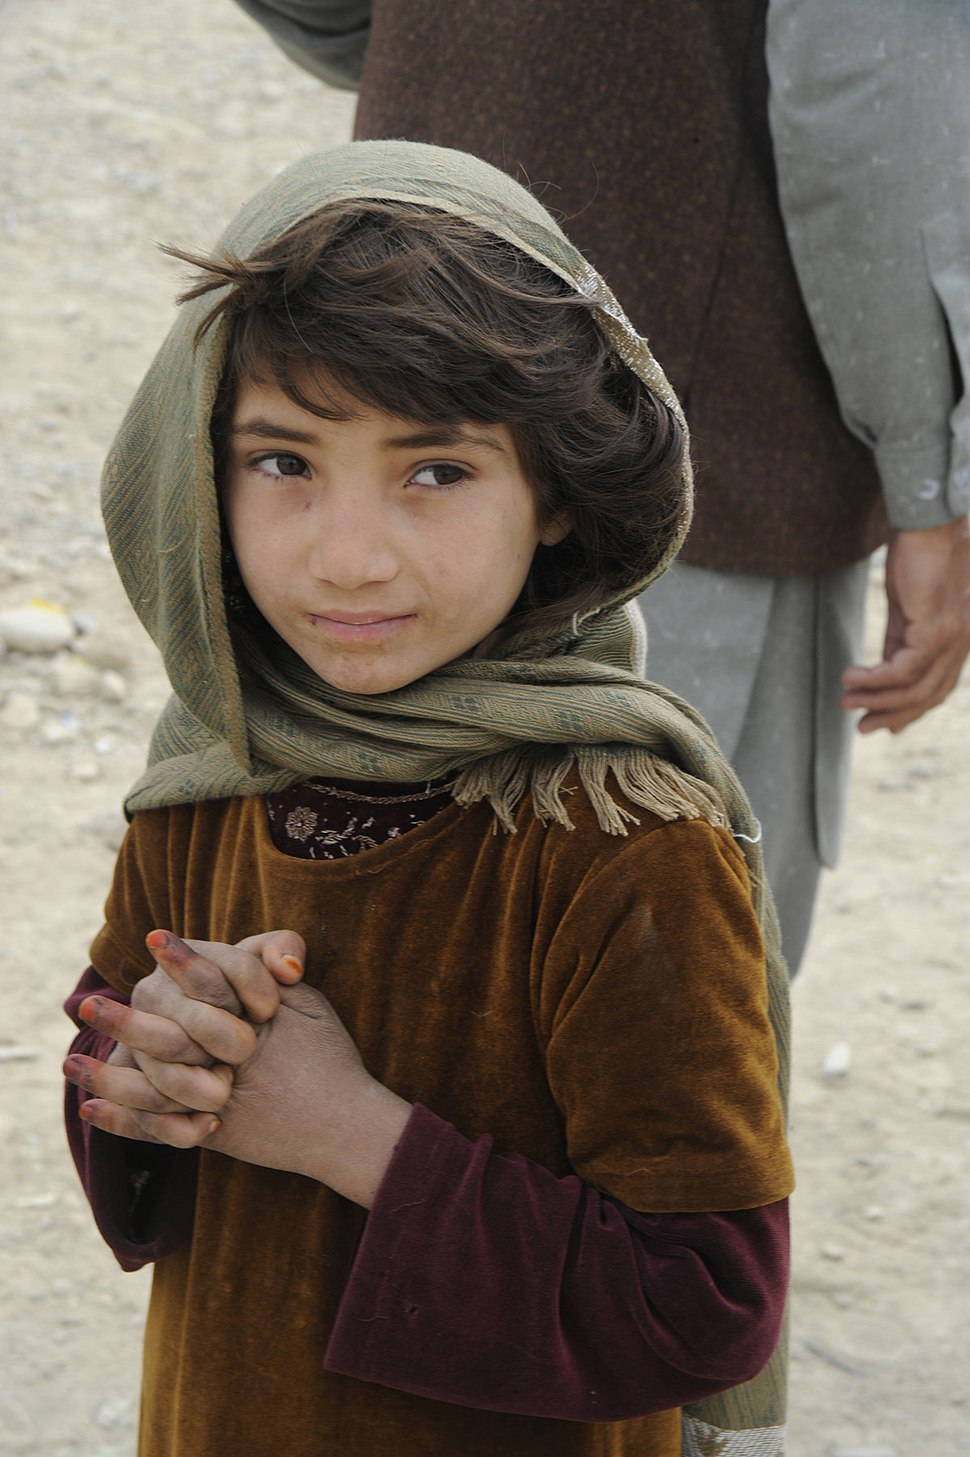 Flickr - DVIDSHUB - PRT donates clothing, blankets to Khowst orphanage (Image 2 of 5)